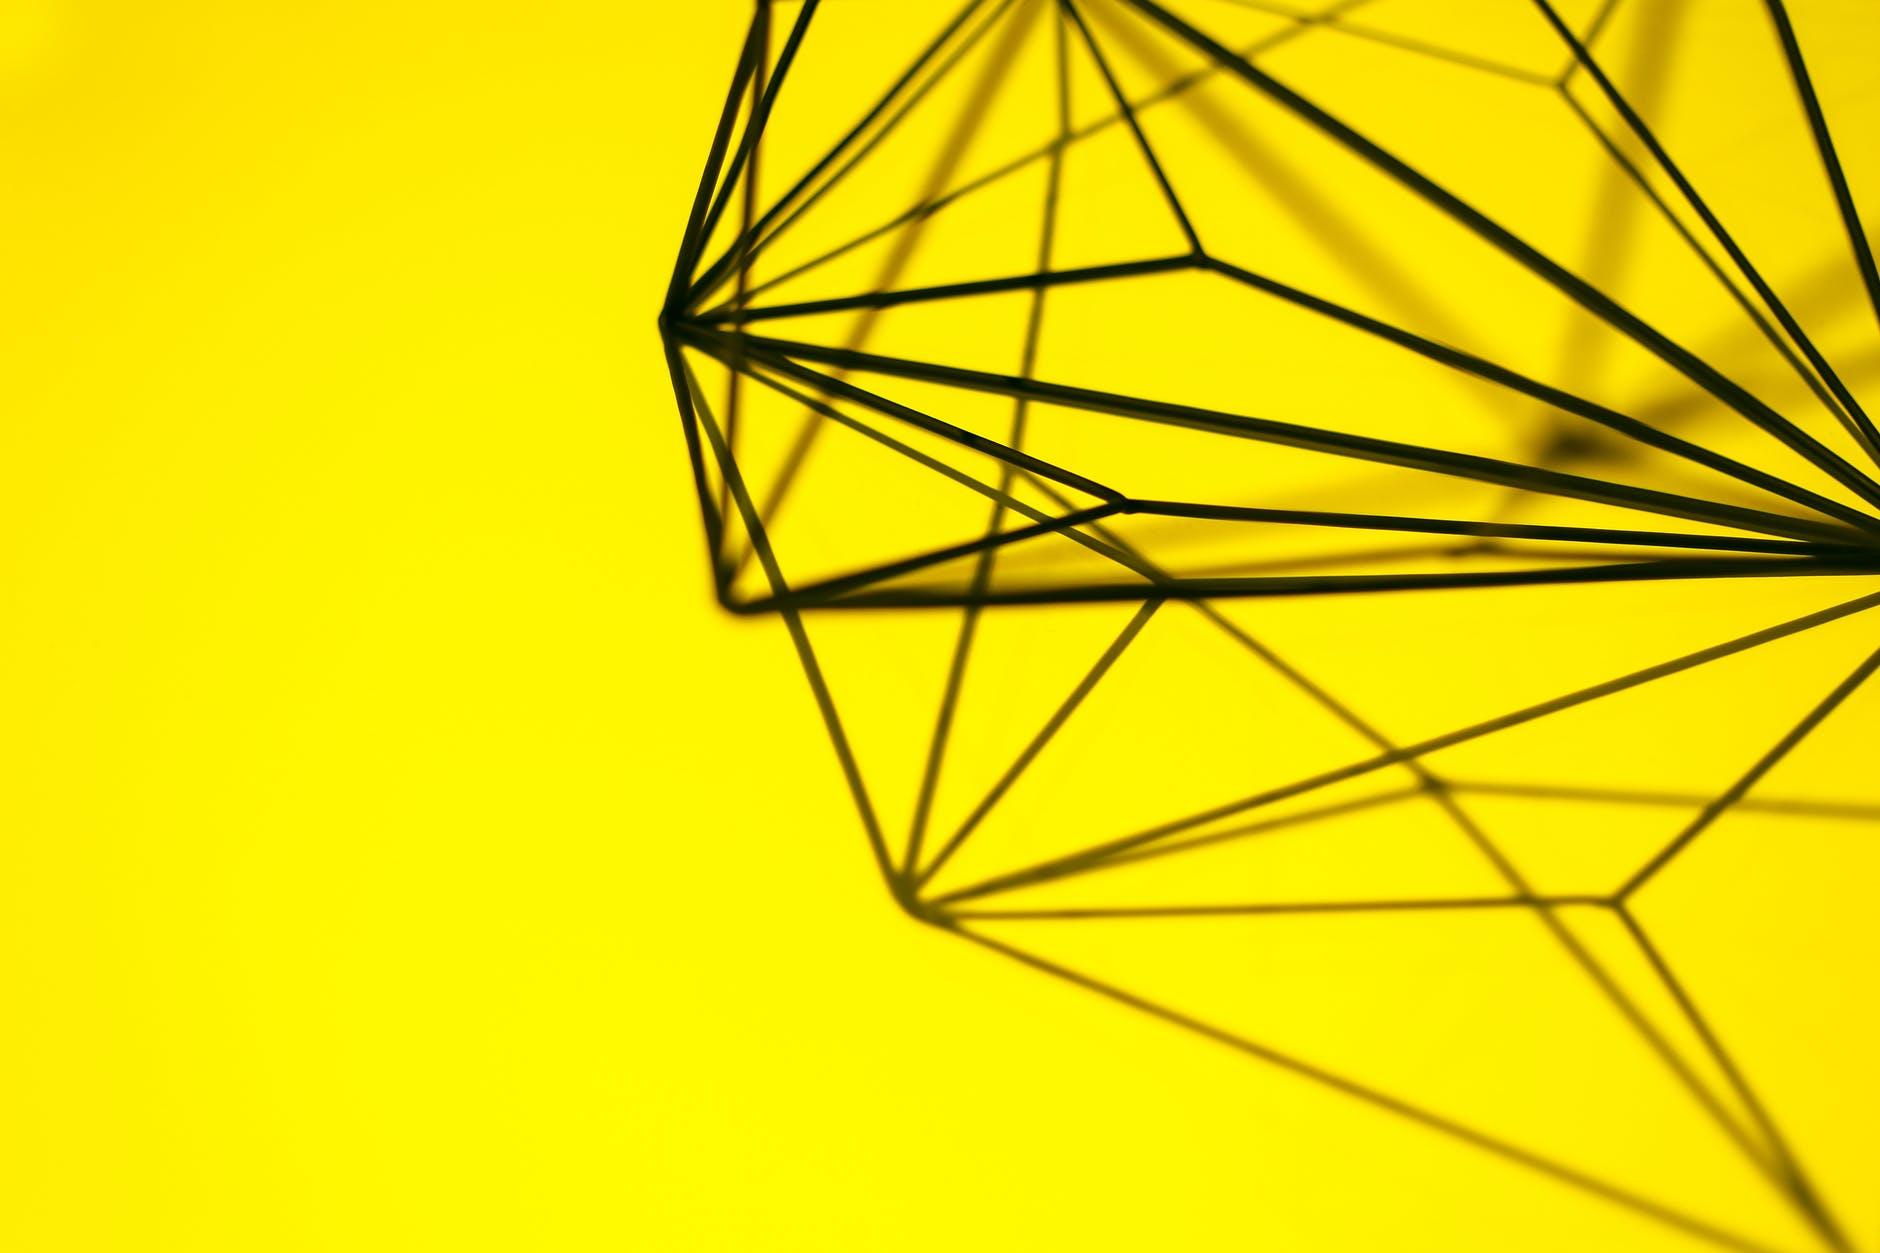 geometric decoration